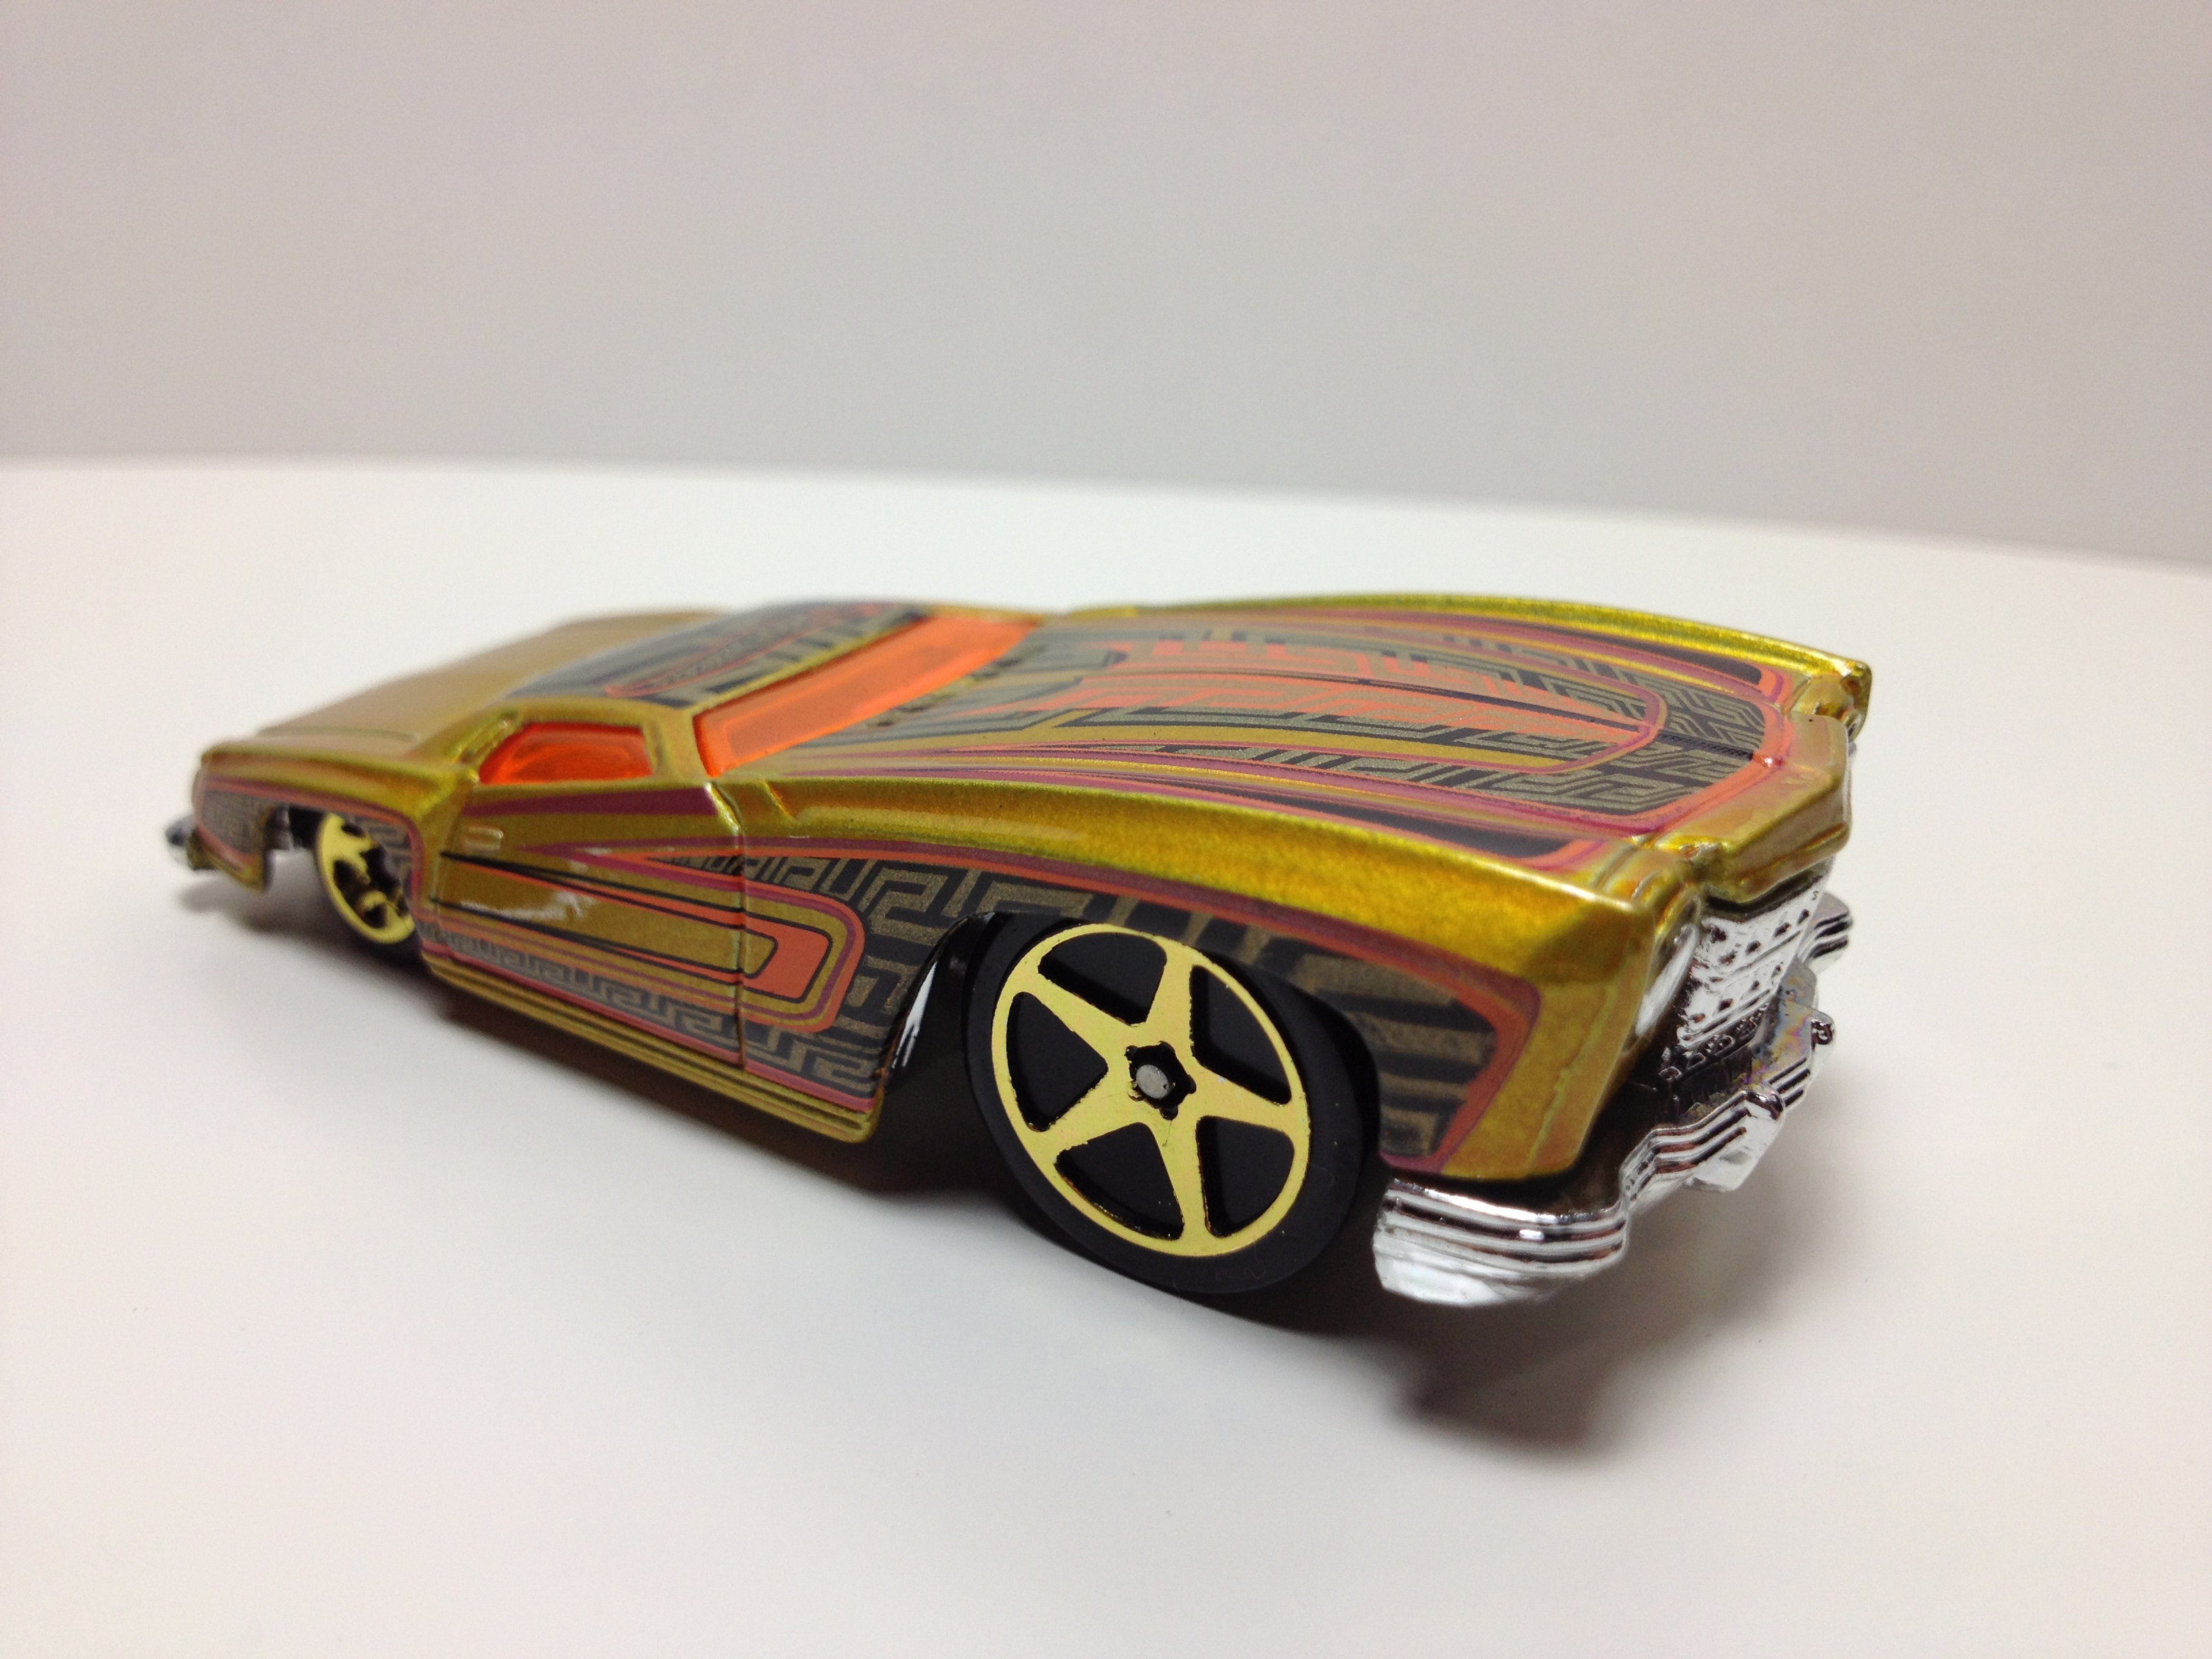 1974 Chevy Monte Carlo (Hardnoze)